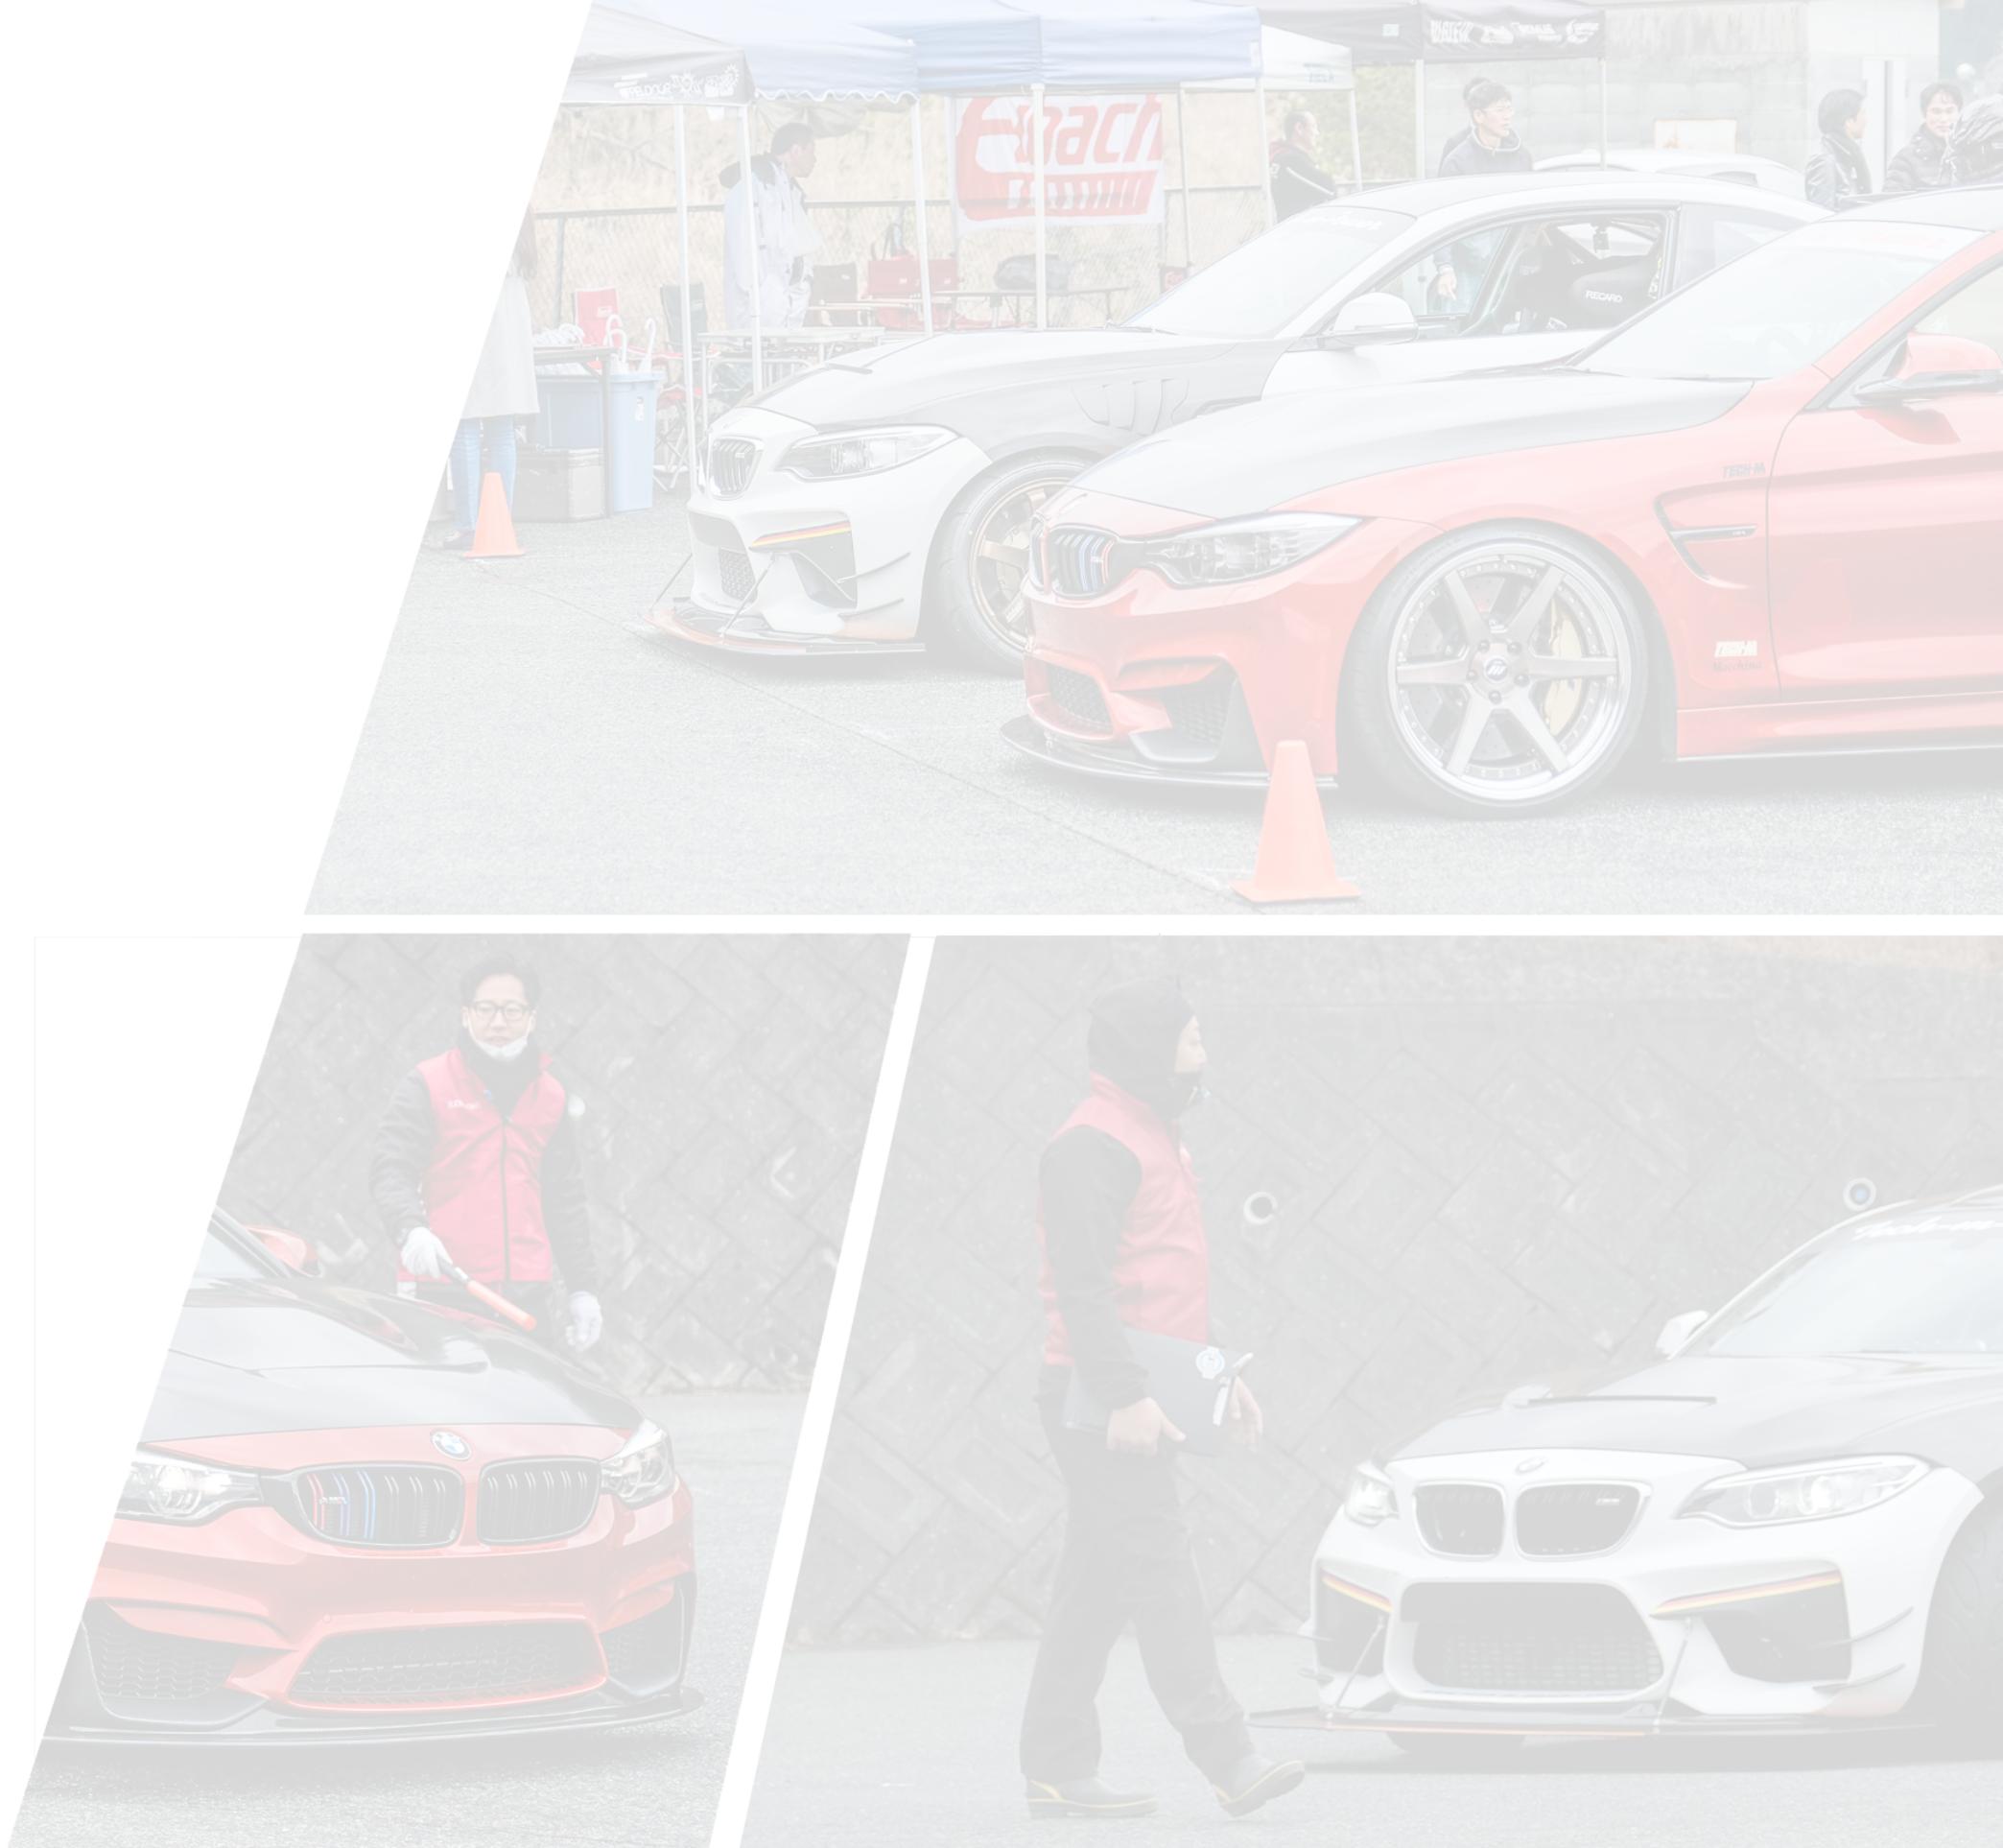 BMW、BMW MINI専門店のTECH-M主催イベント、TECH-M CIRCUITE EXPERIENCE